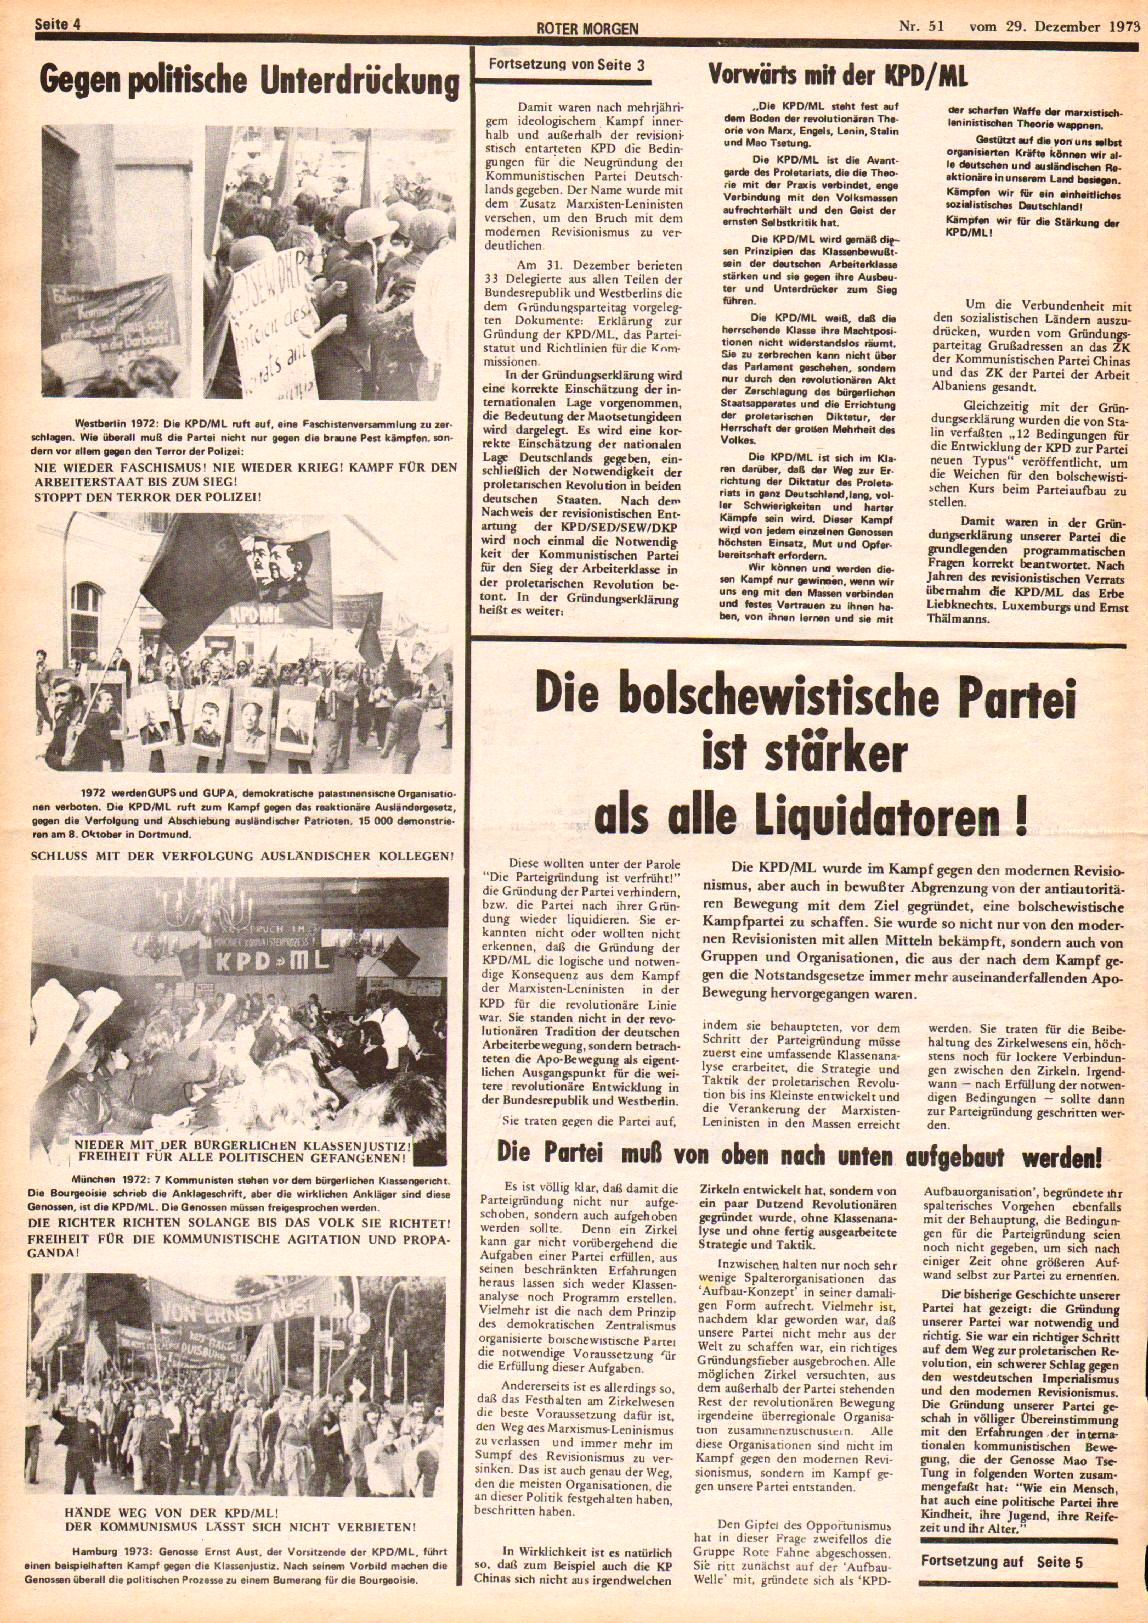 Roter Morgen, 7. Jg., 29. Dezember 1973, Nr. 51, Seite 4